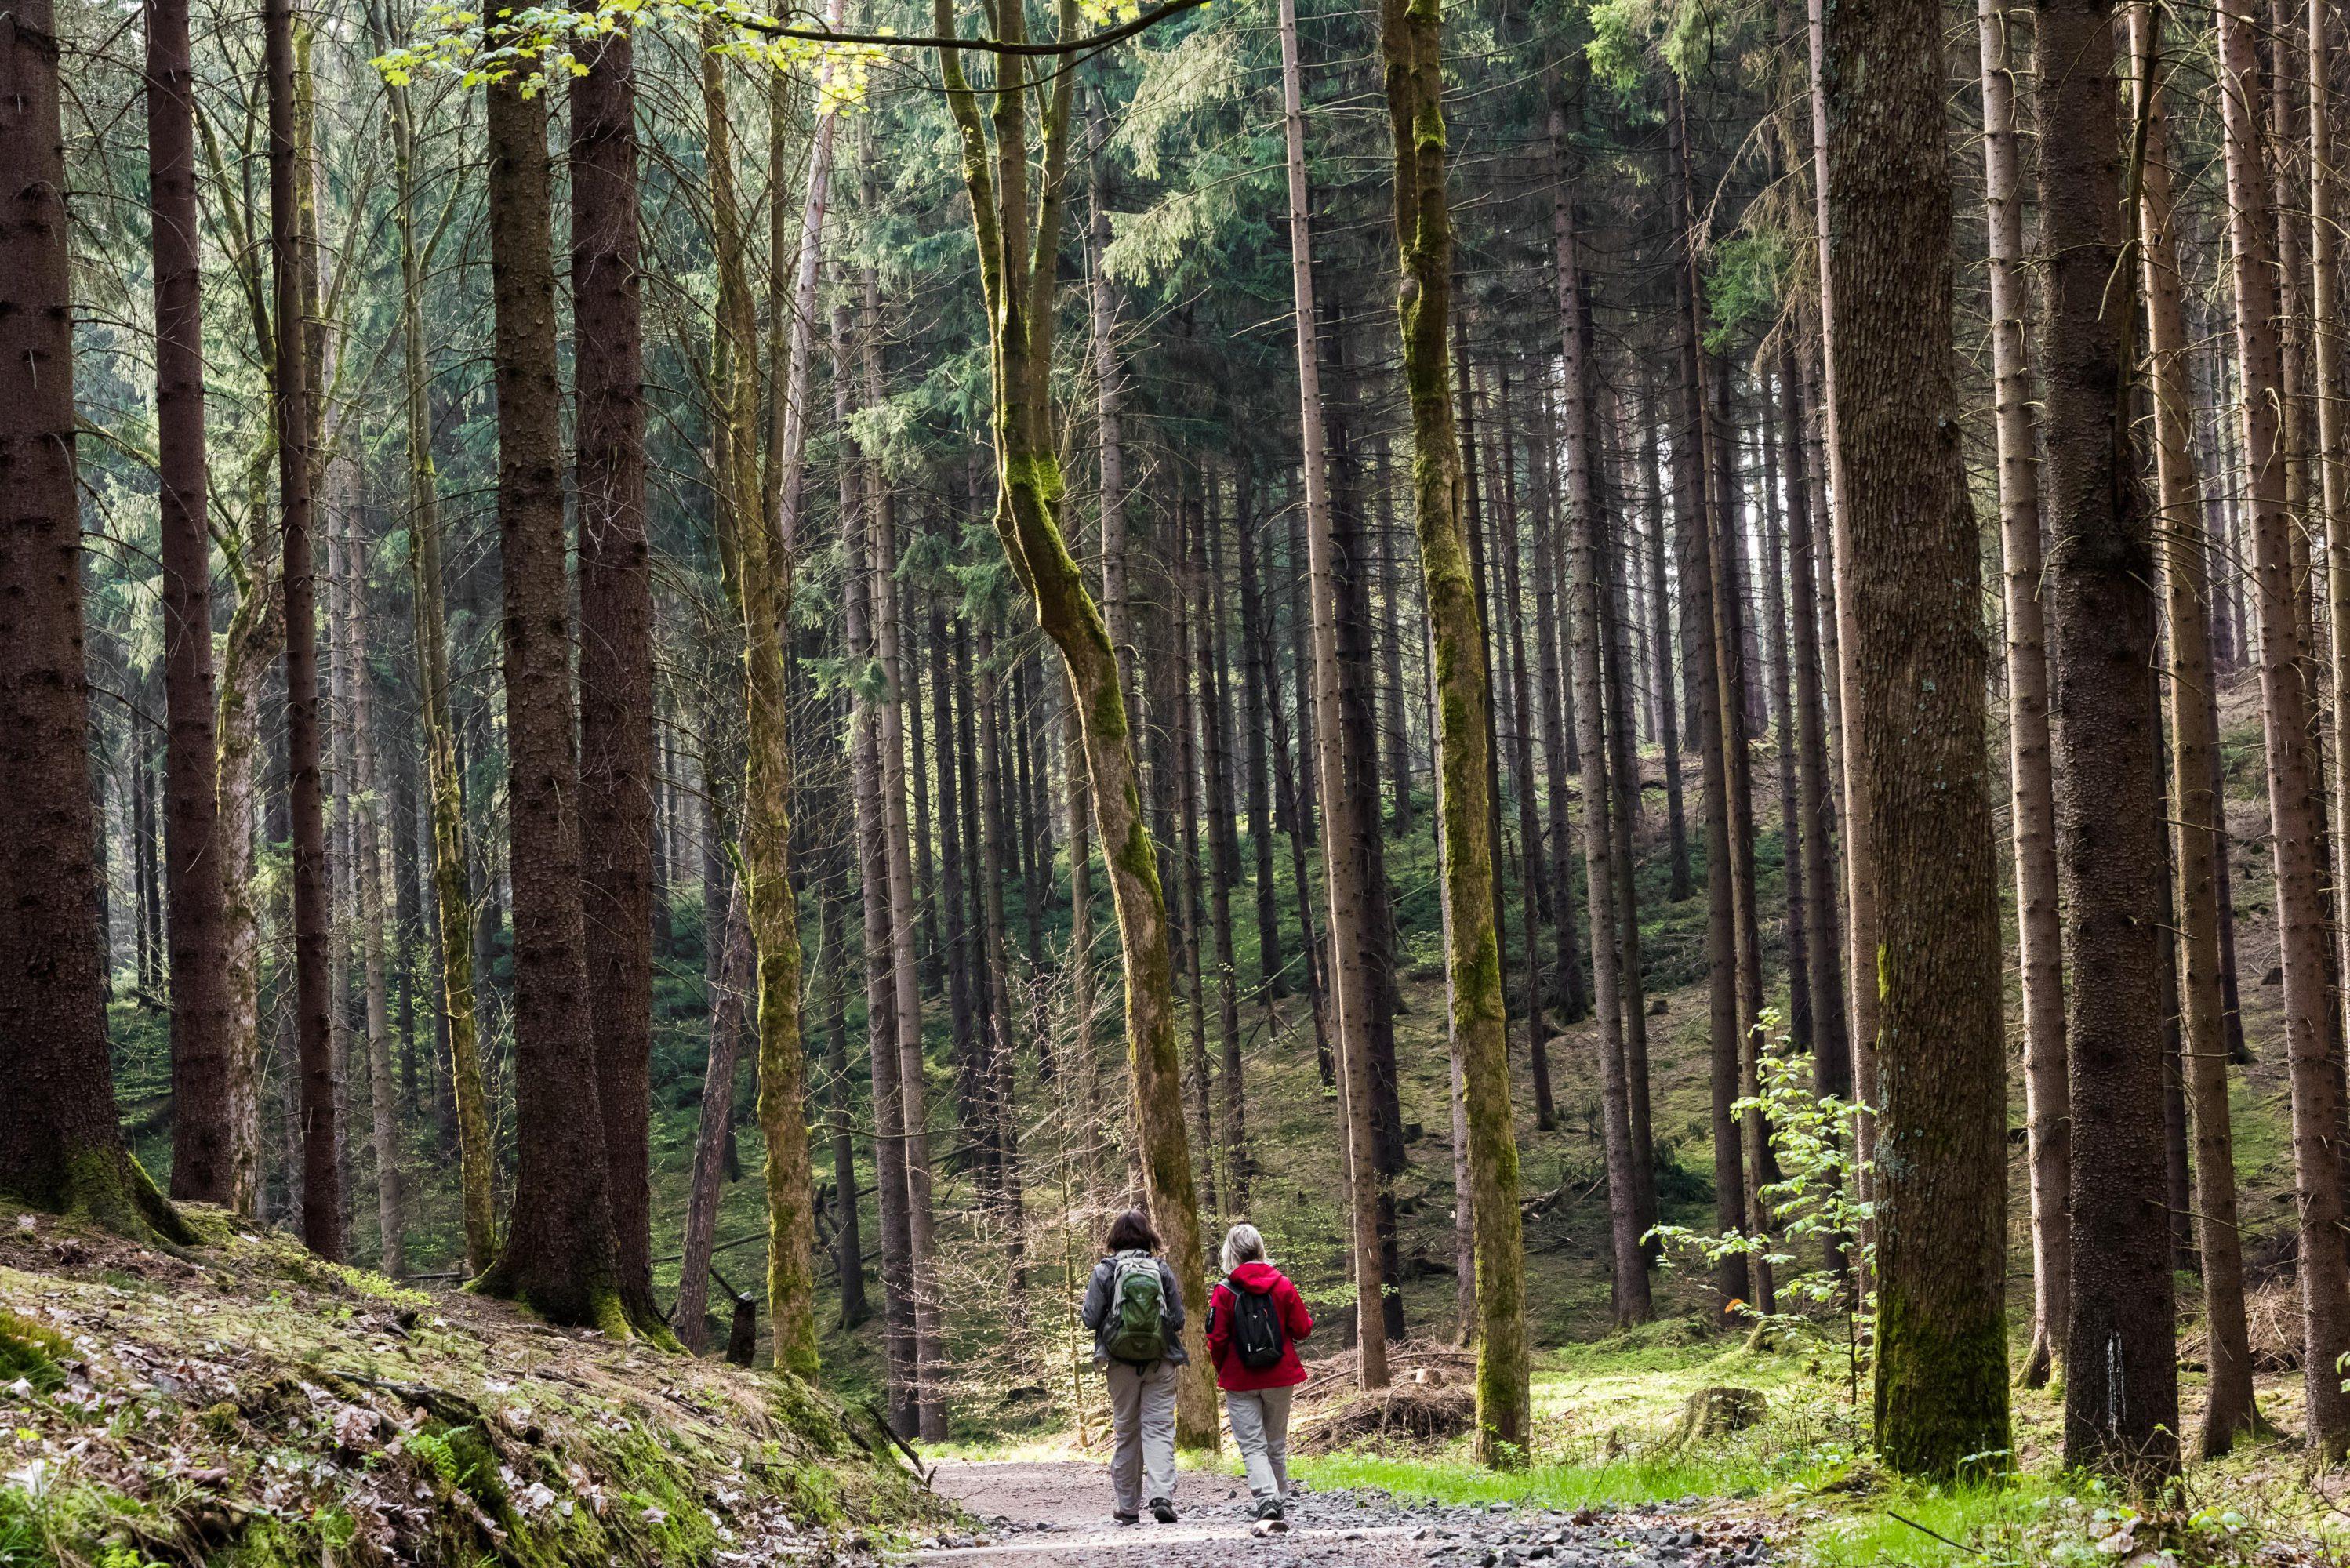 Wanderung Wilde Klamm (c) ThielPR, Sebastian Thiel